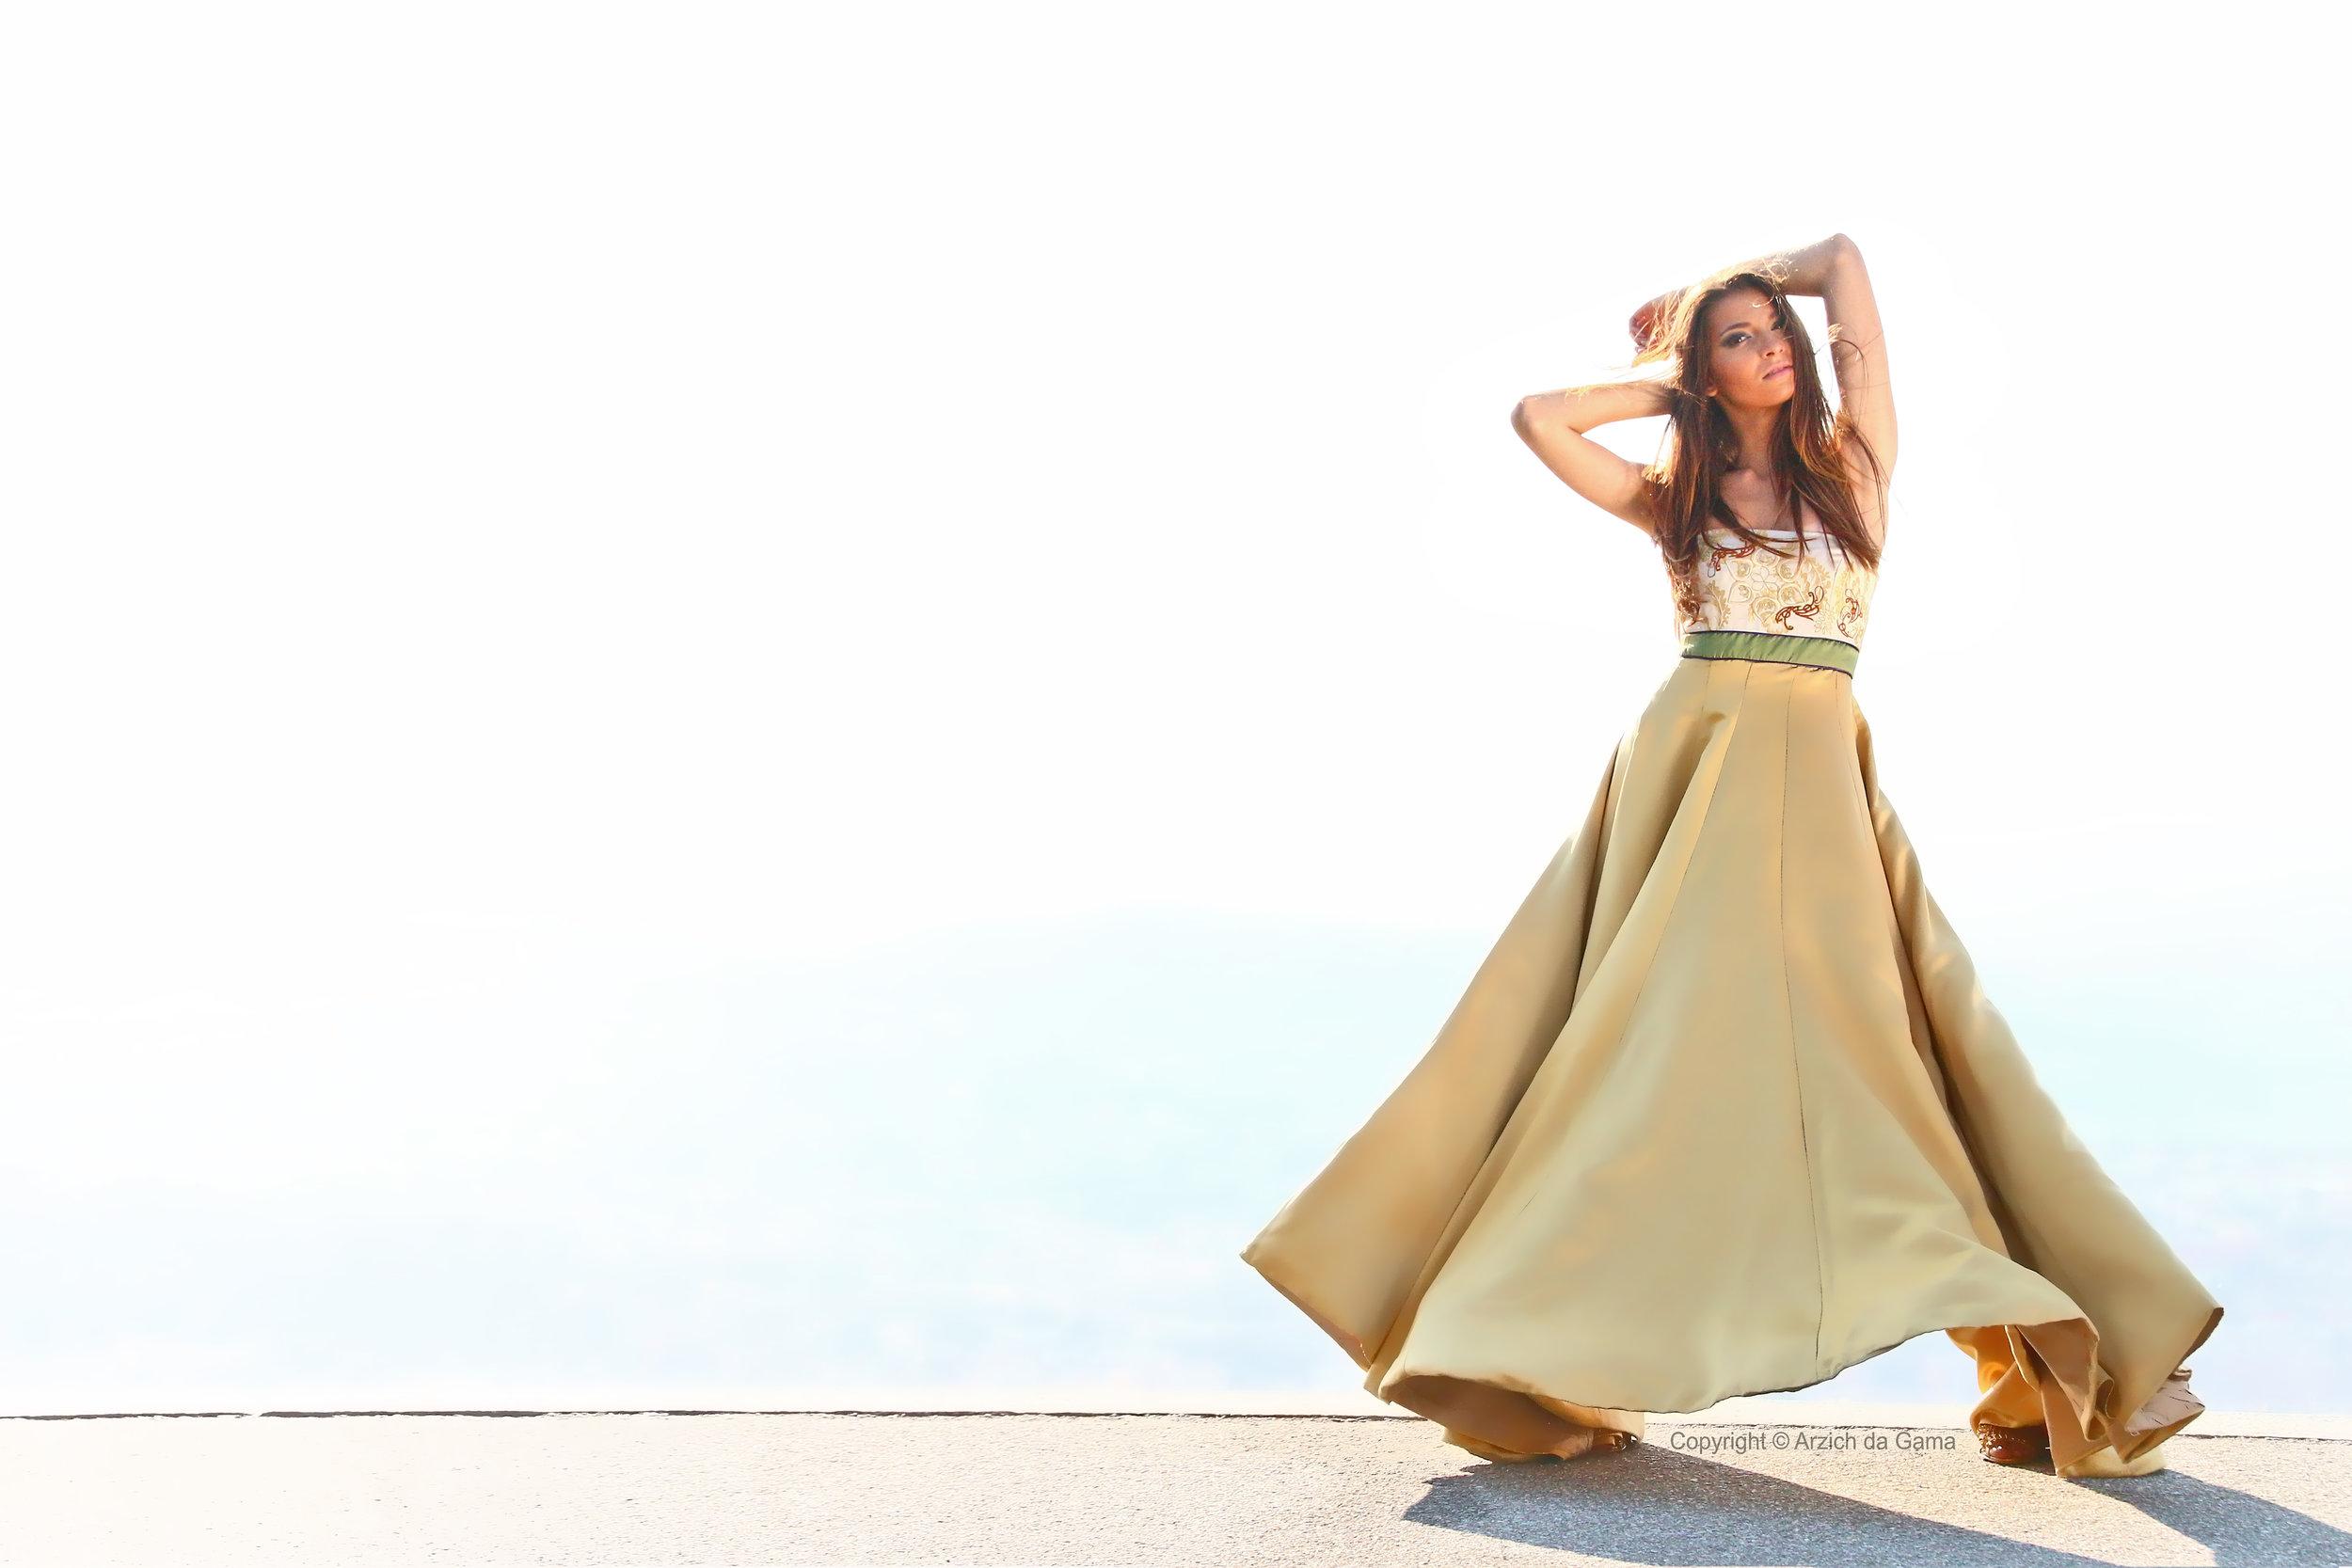 MAra rodrigues - Fashion Designer / Collection 2015 / Braga